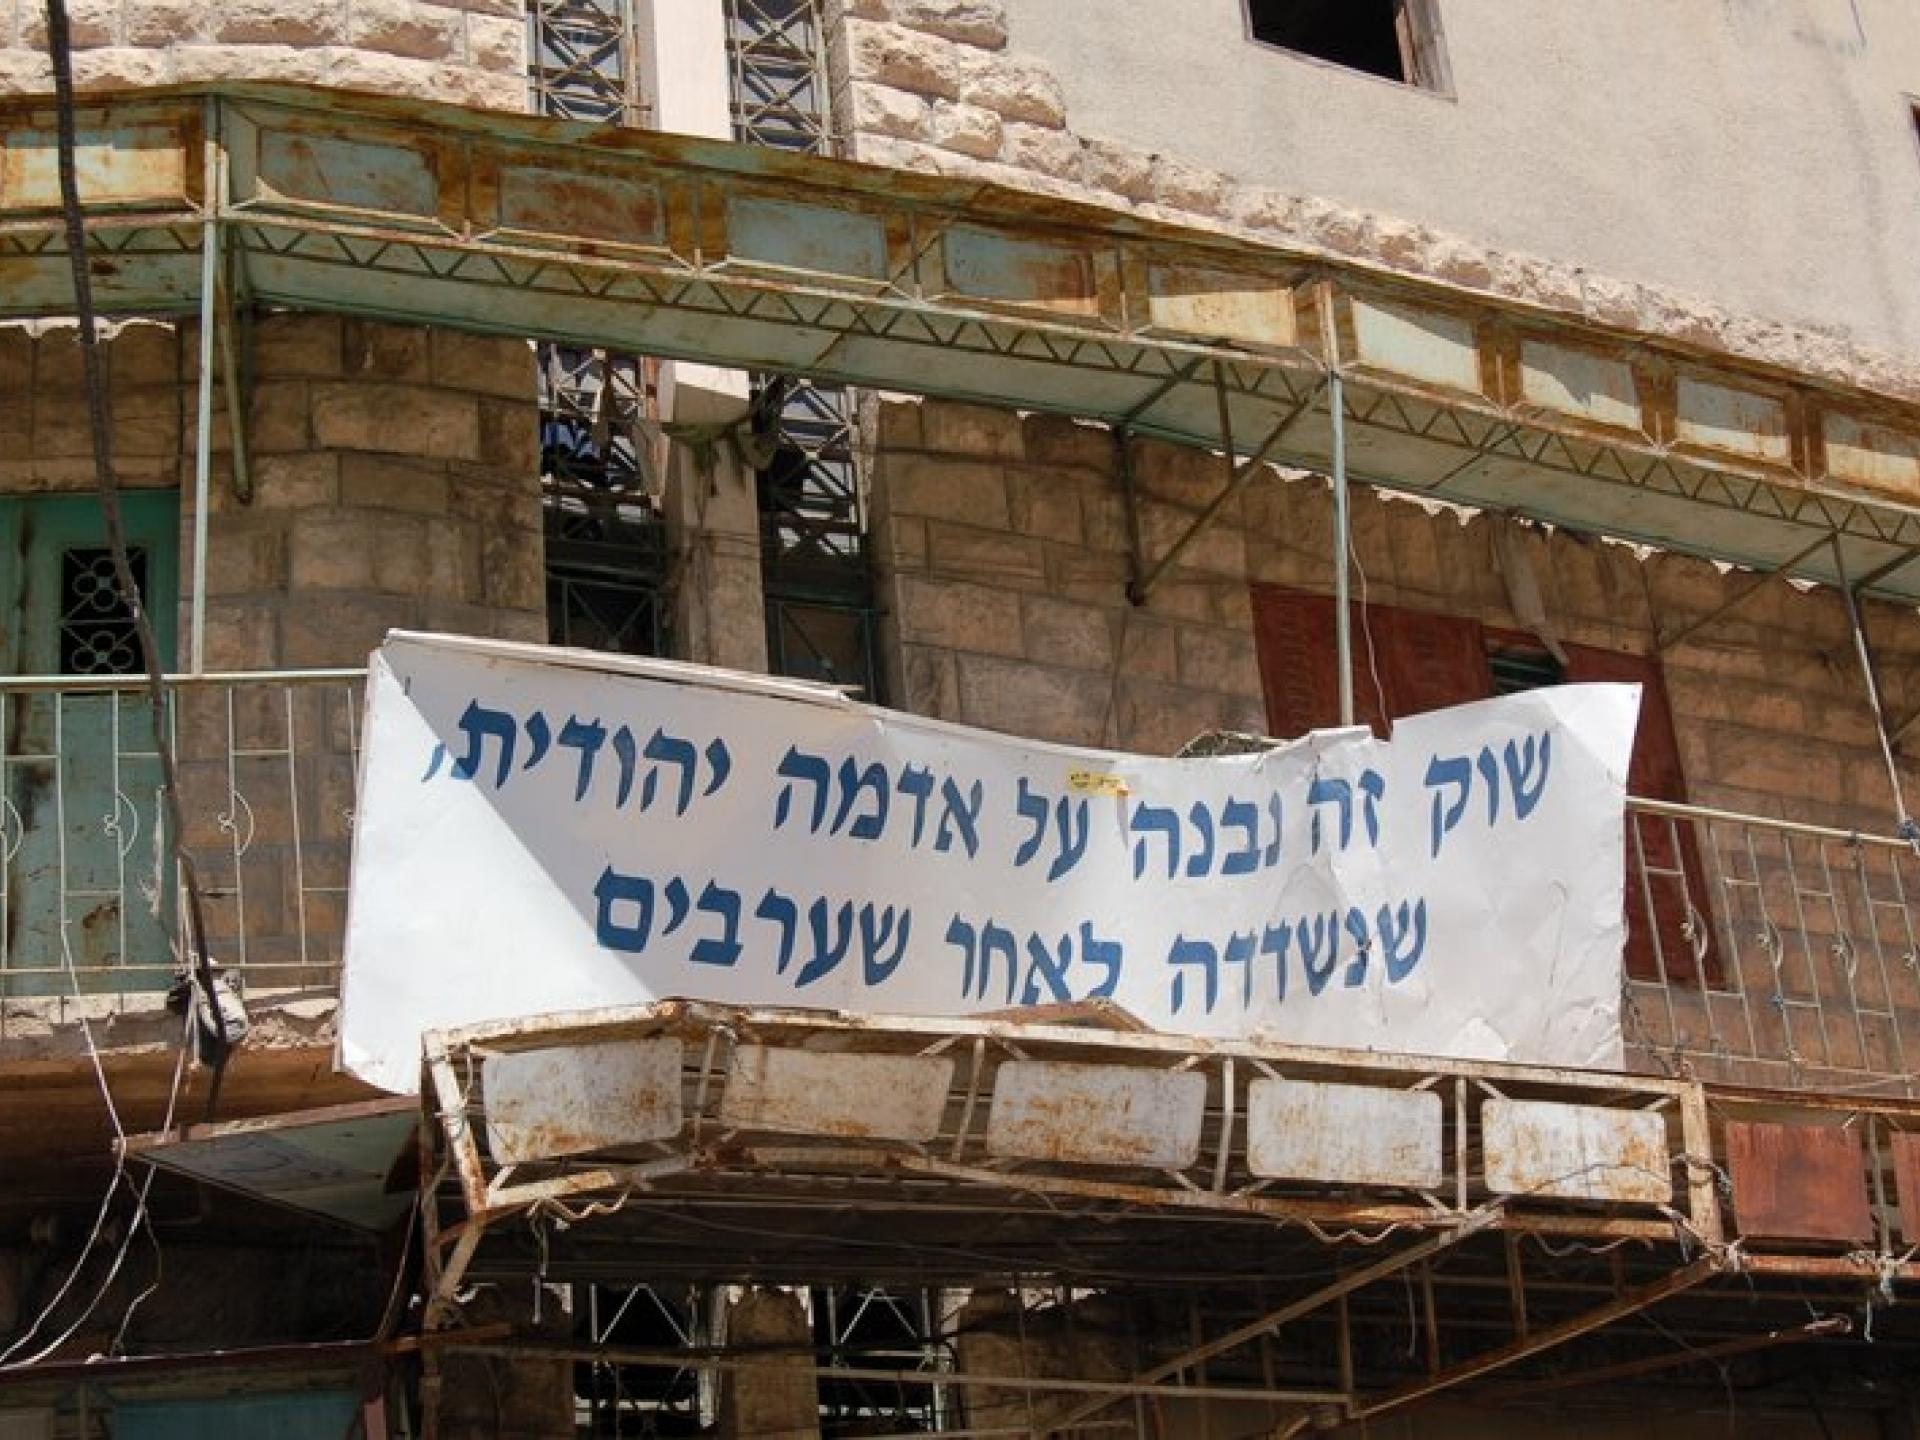 Hebron 13.07.07